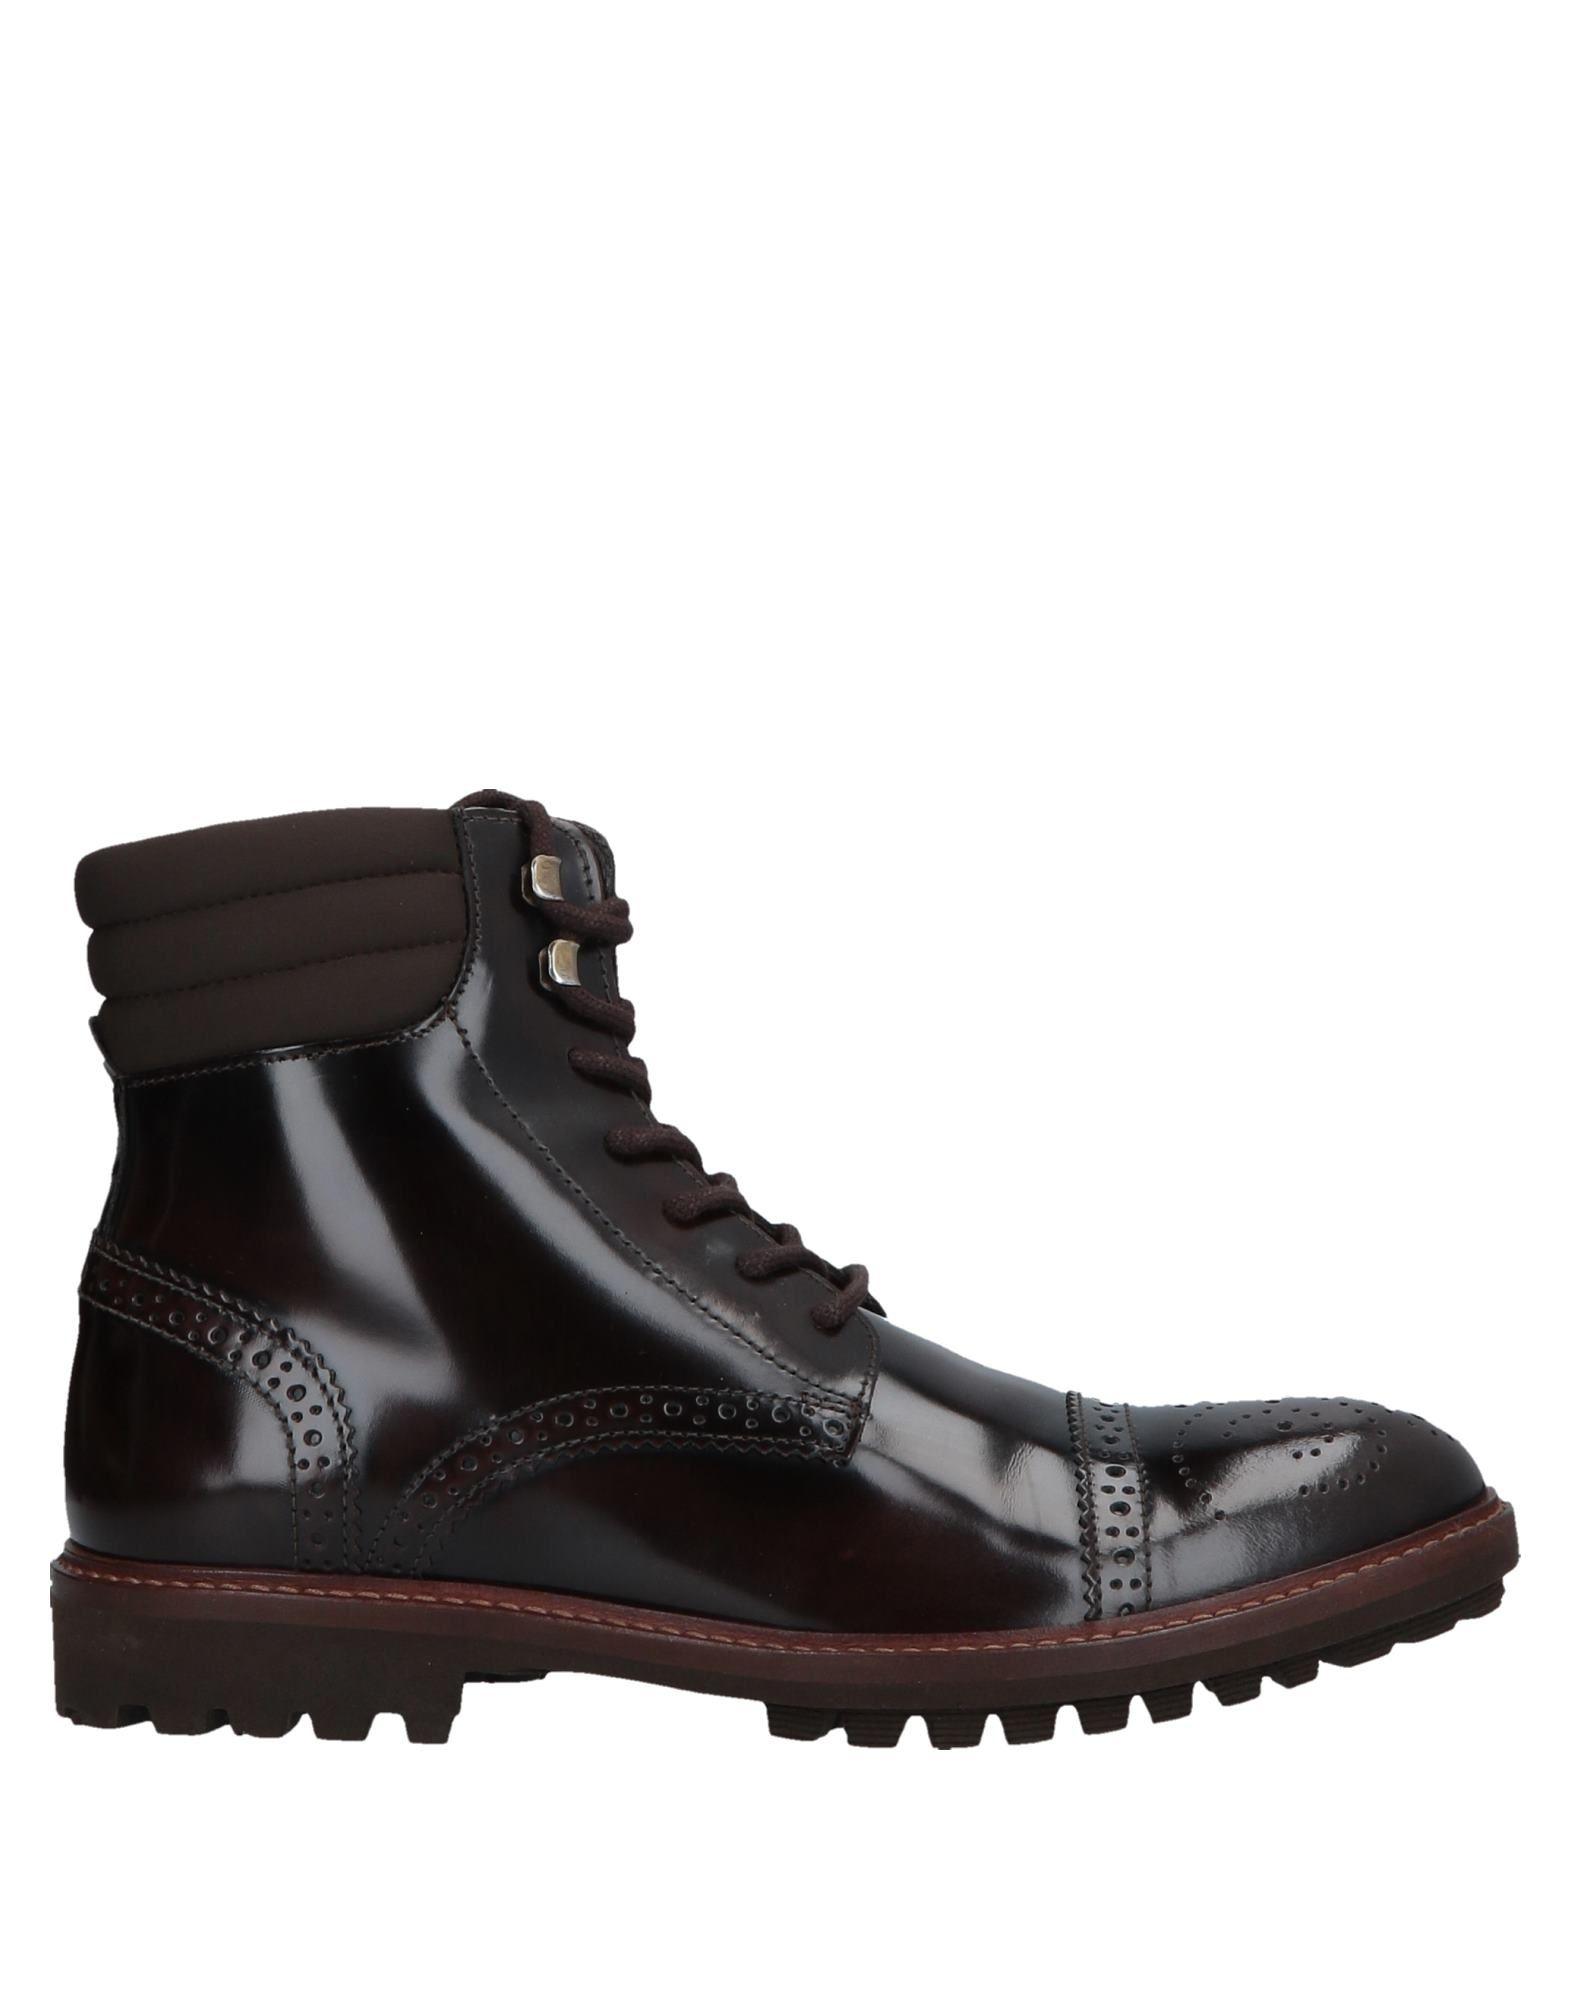 Stivaletti Trussardi Trussardi Jeans uomo - 11678598VG